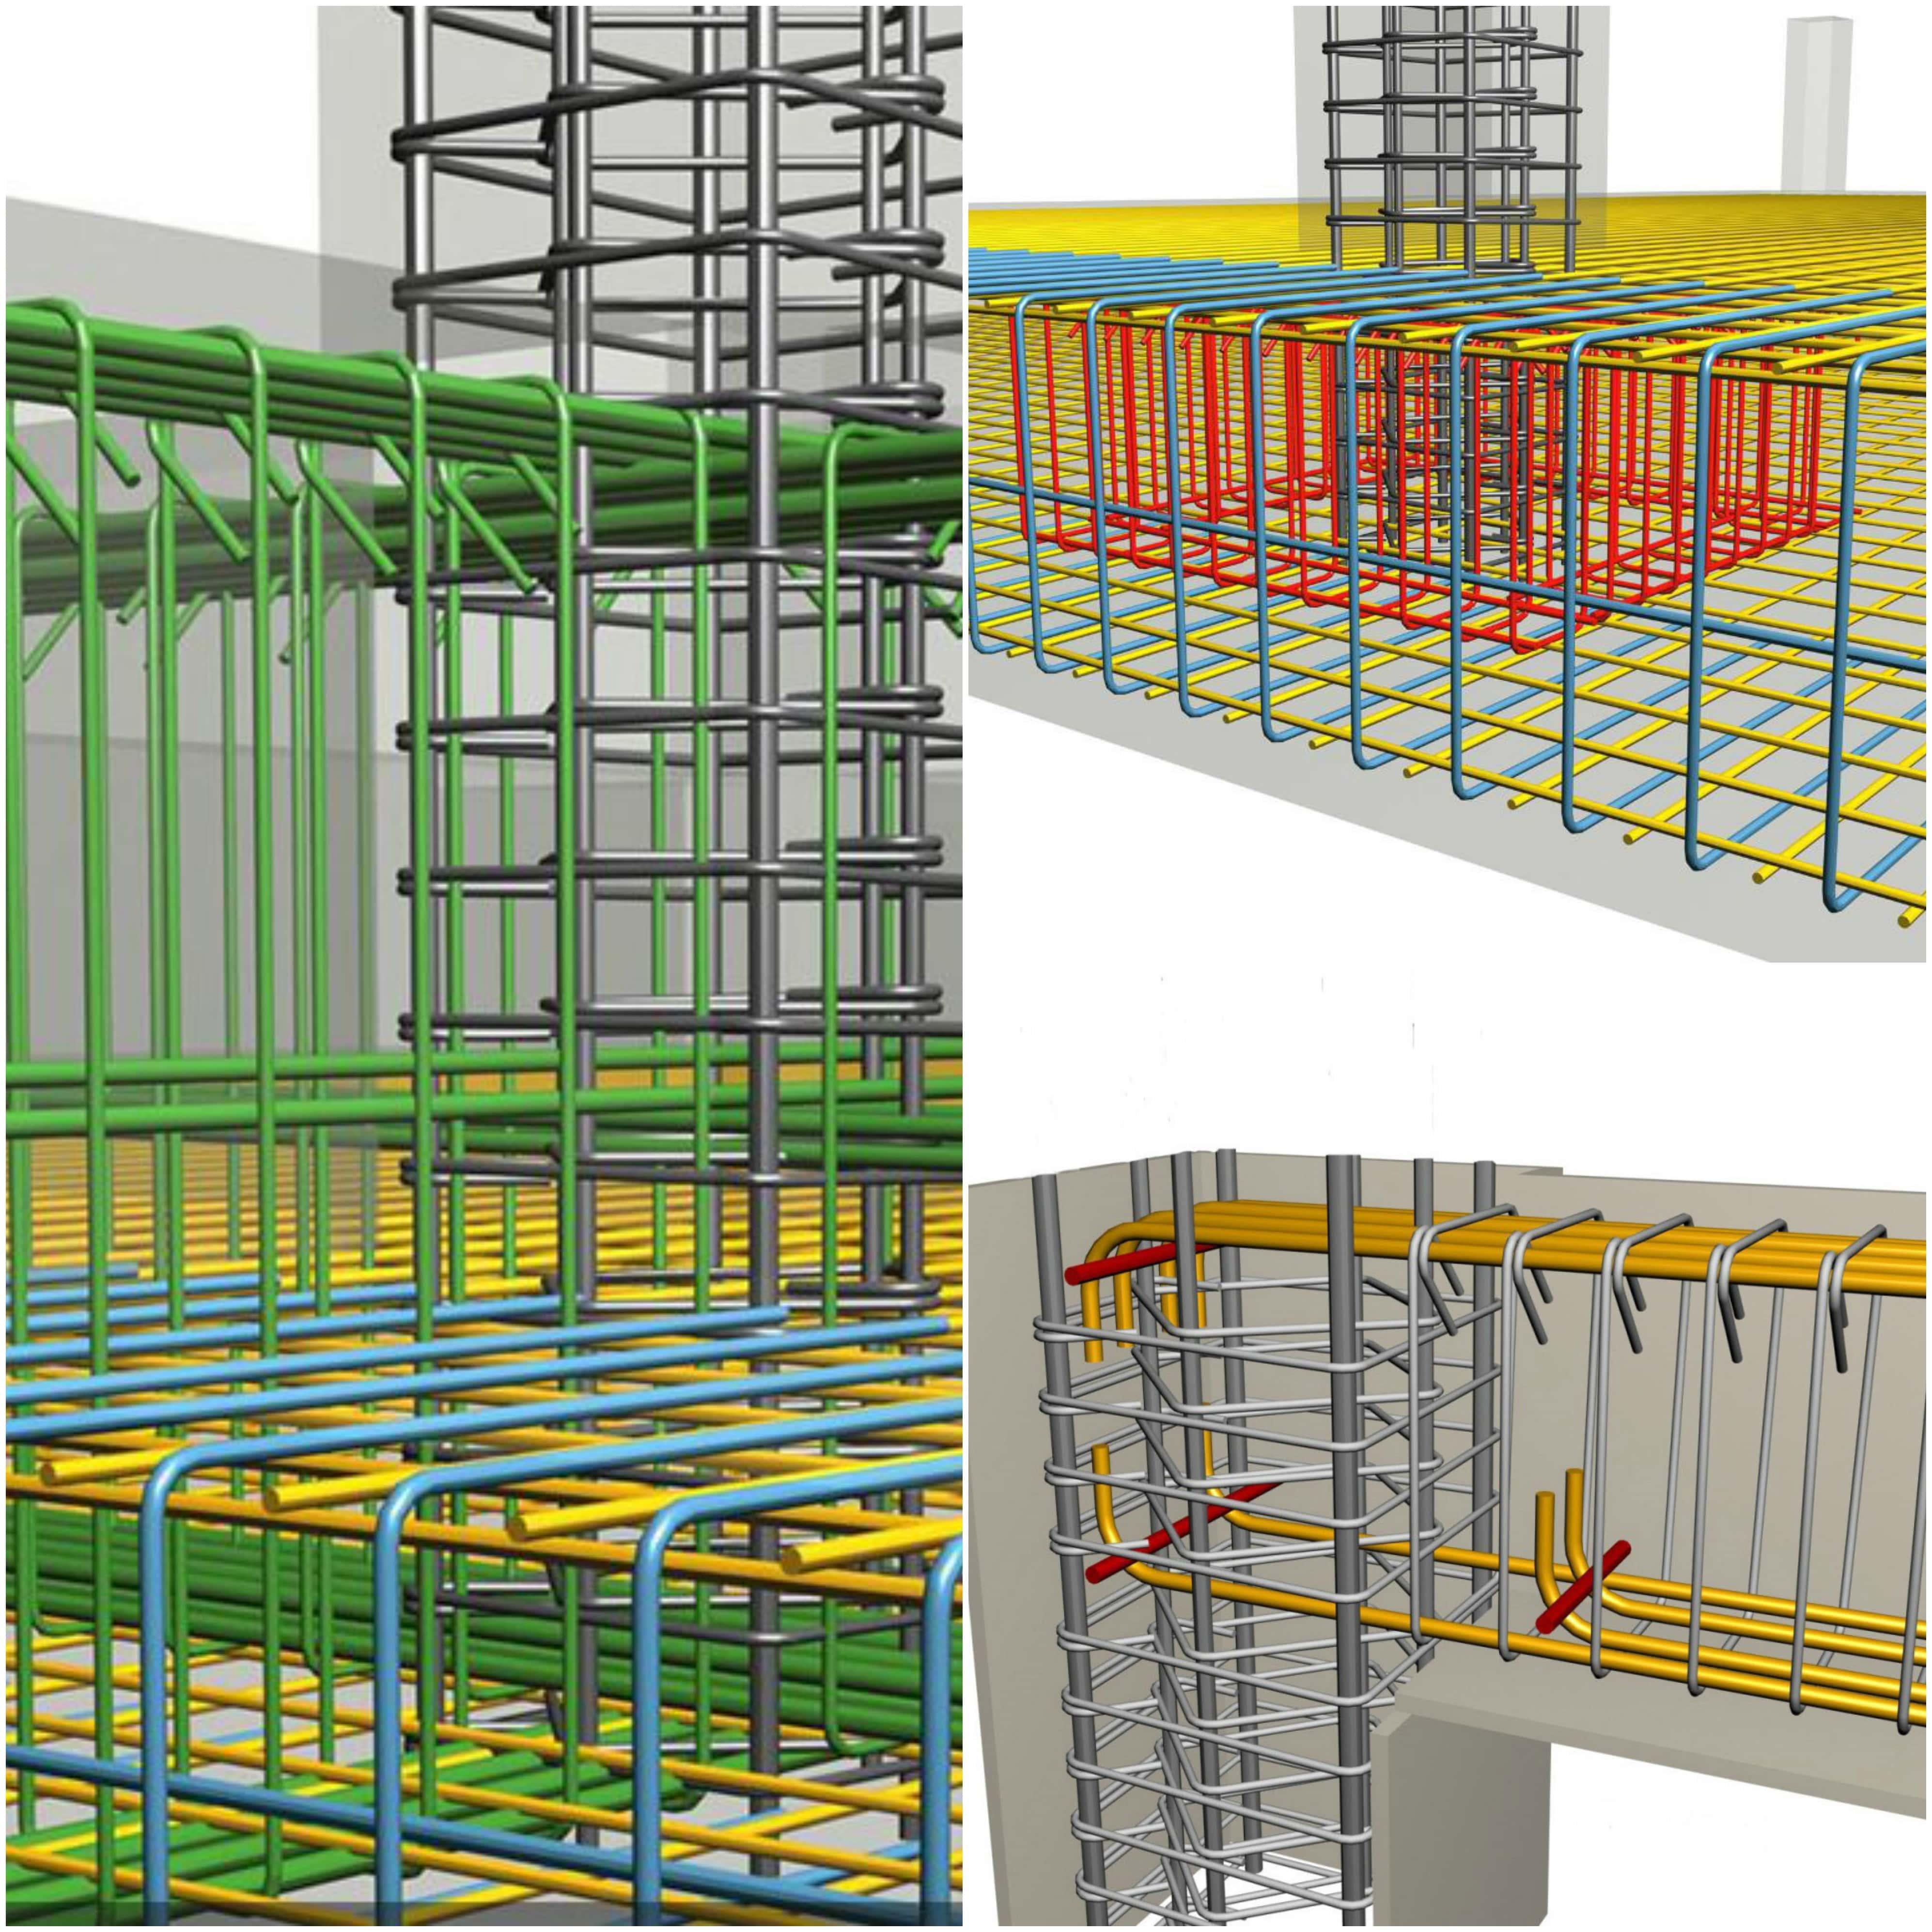 Rebar Detailing & Shop Drawings Services Company image 1